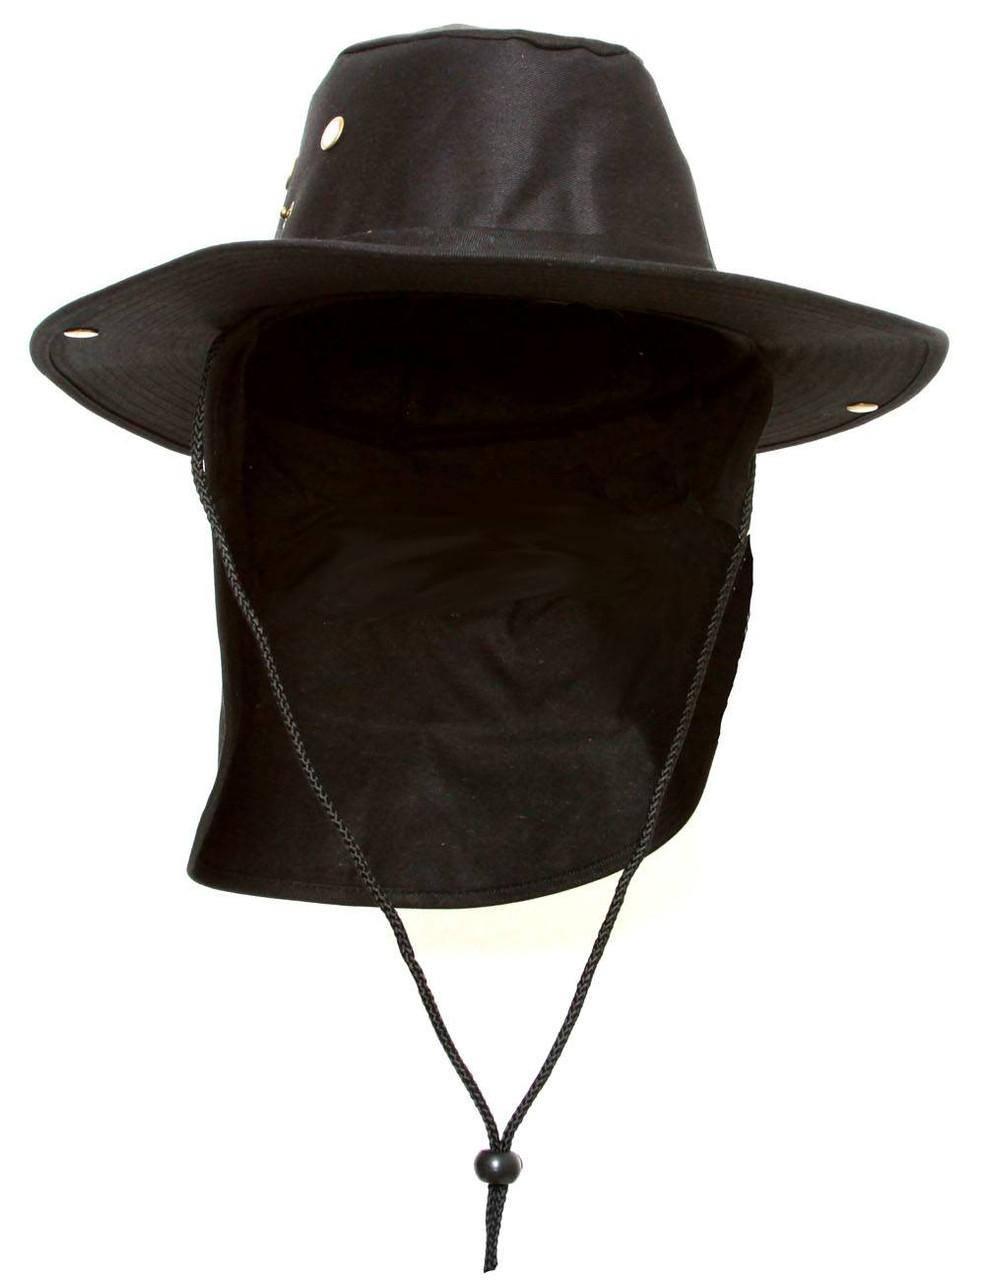 0351d4d115d Top Headwear Safari Explorer Bucket Hat With Flap Neck Cover - Black -  Gravity Trading